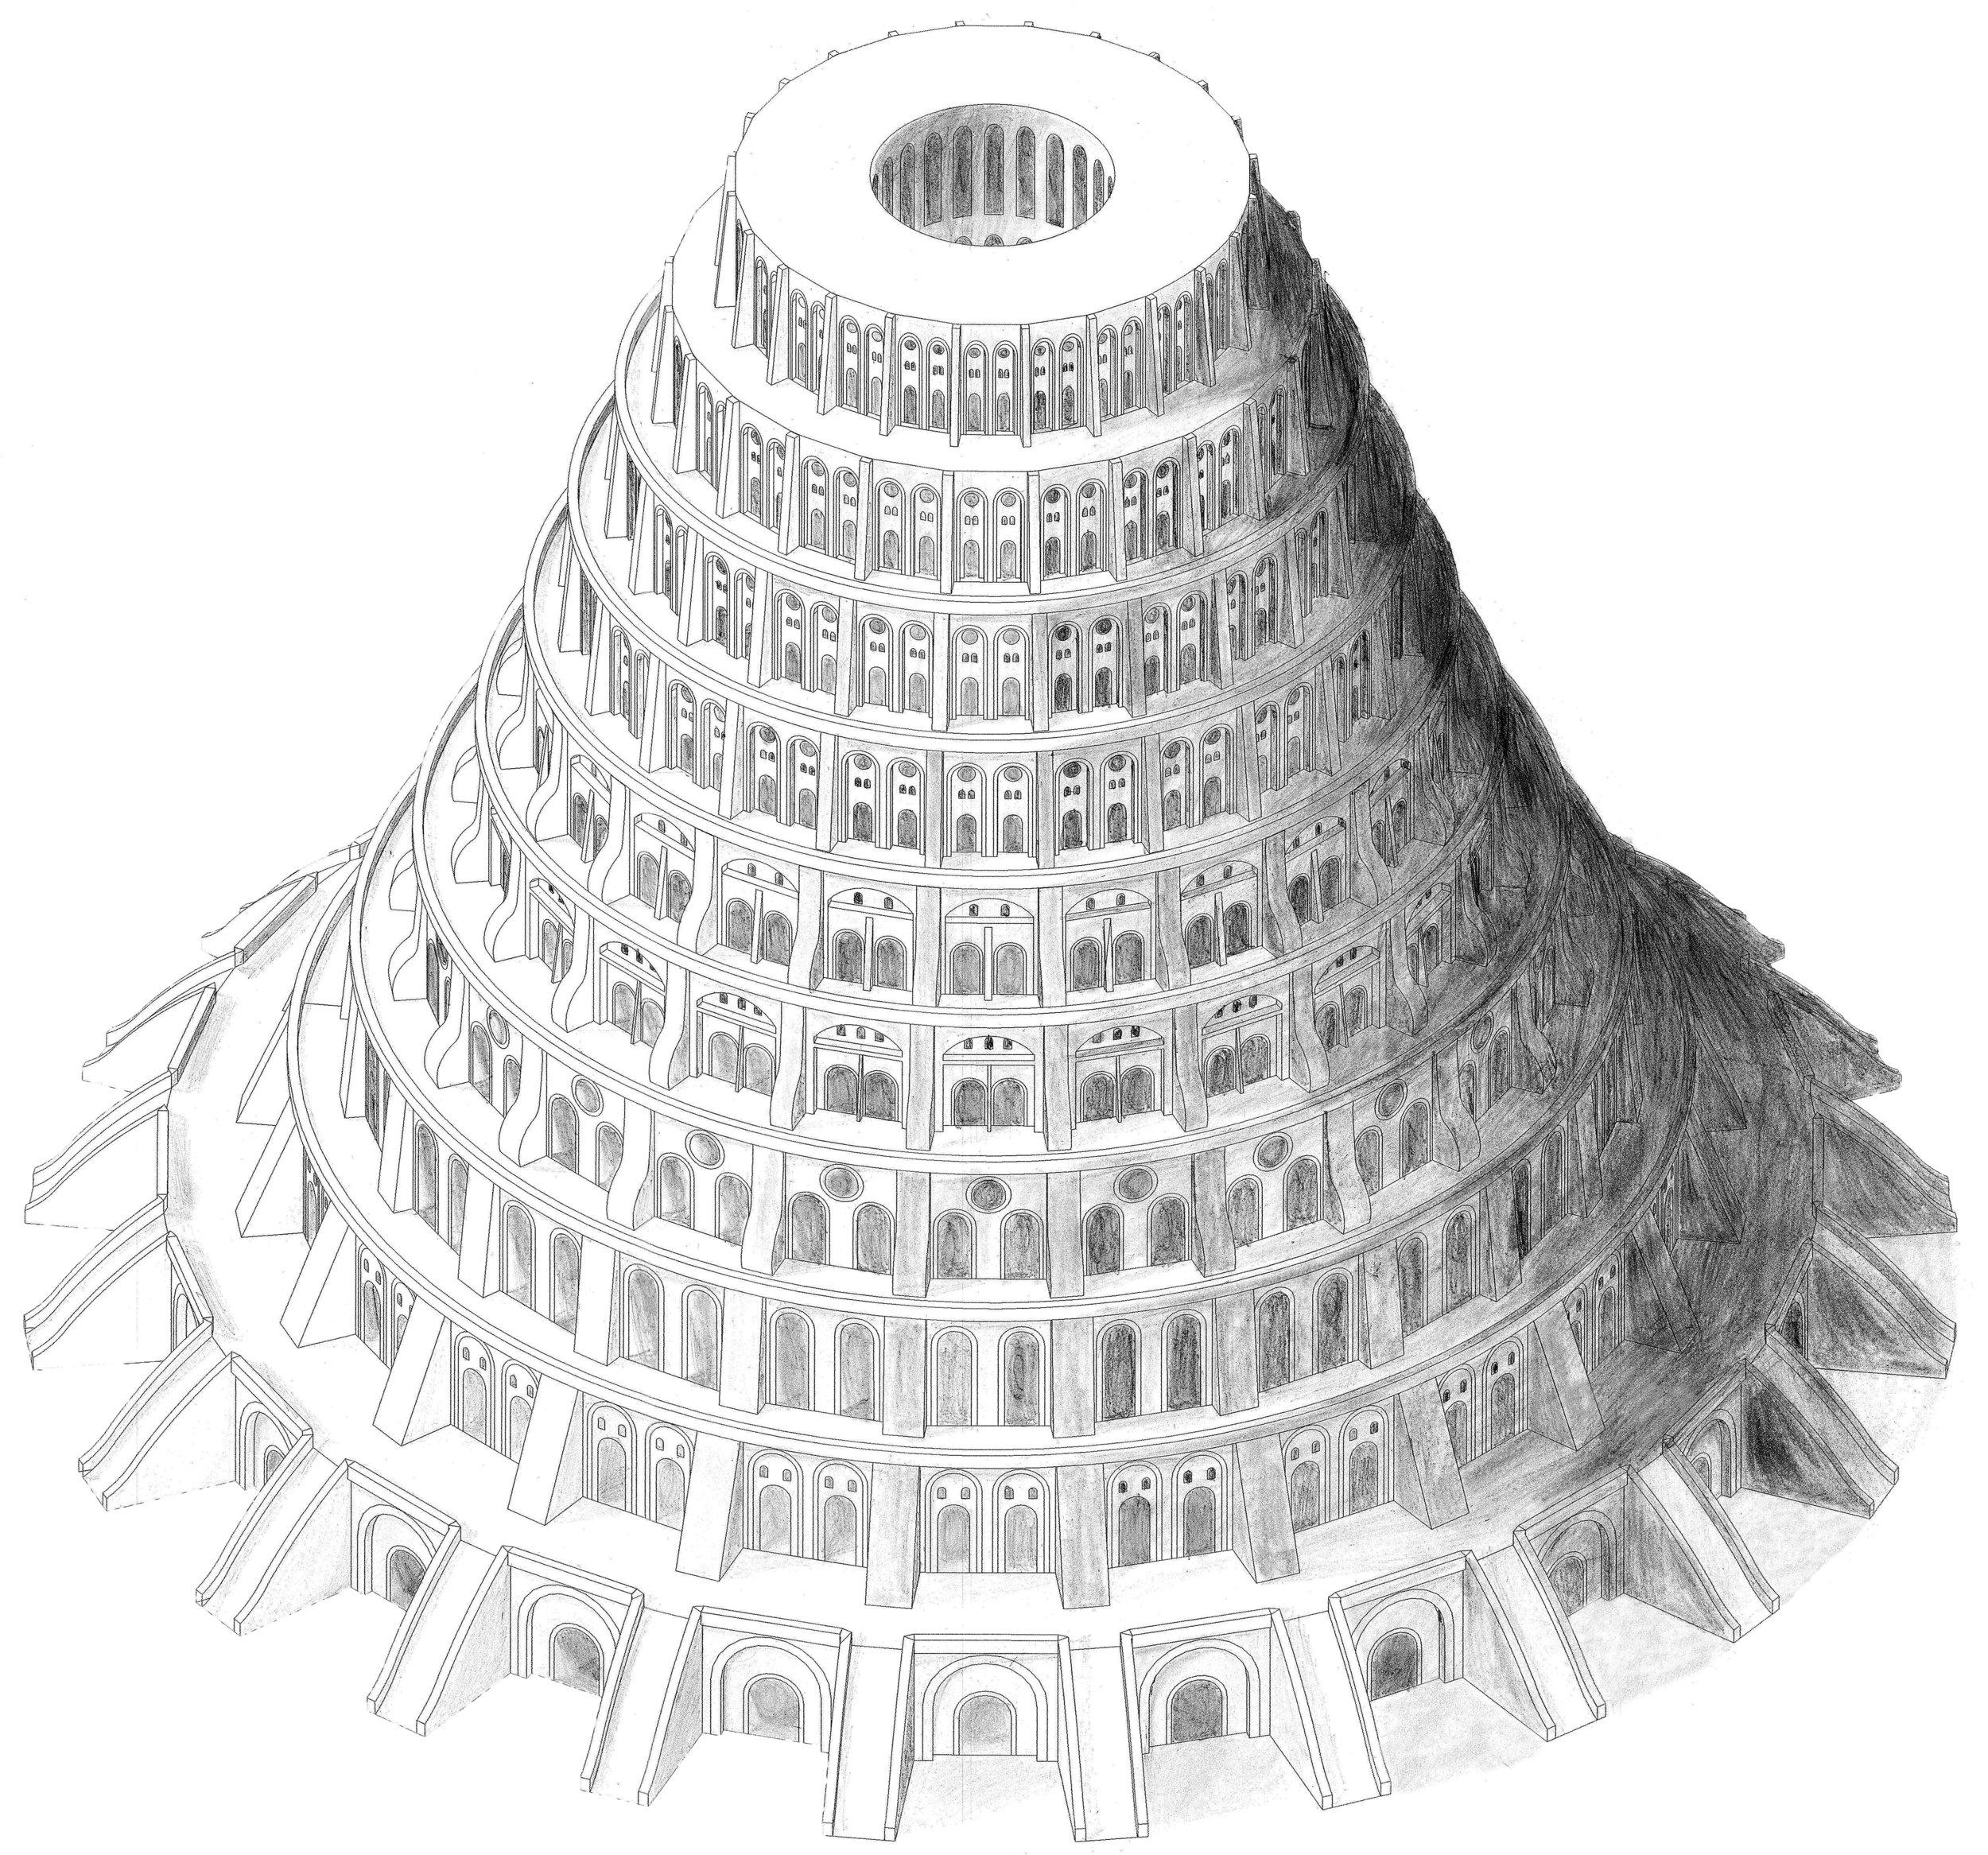 Tower Axon